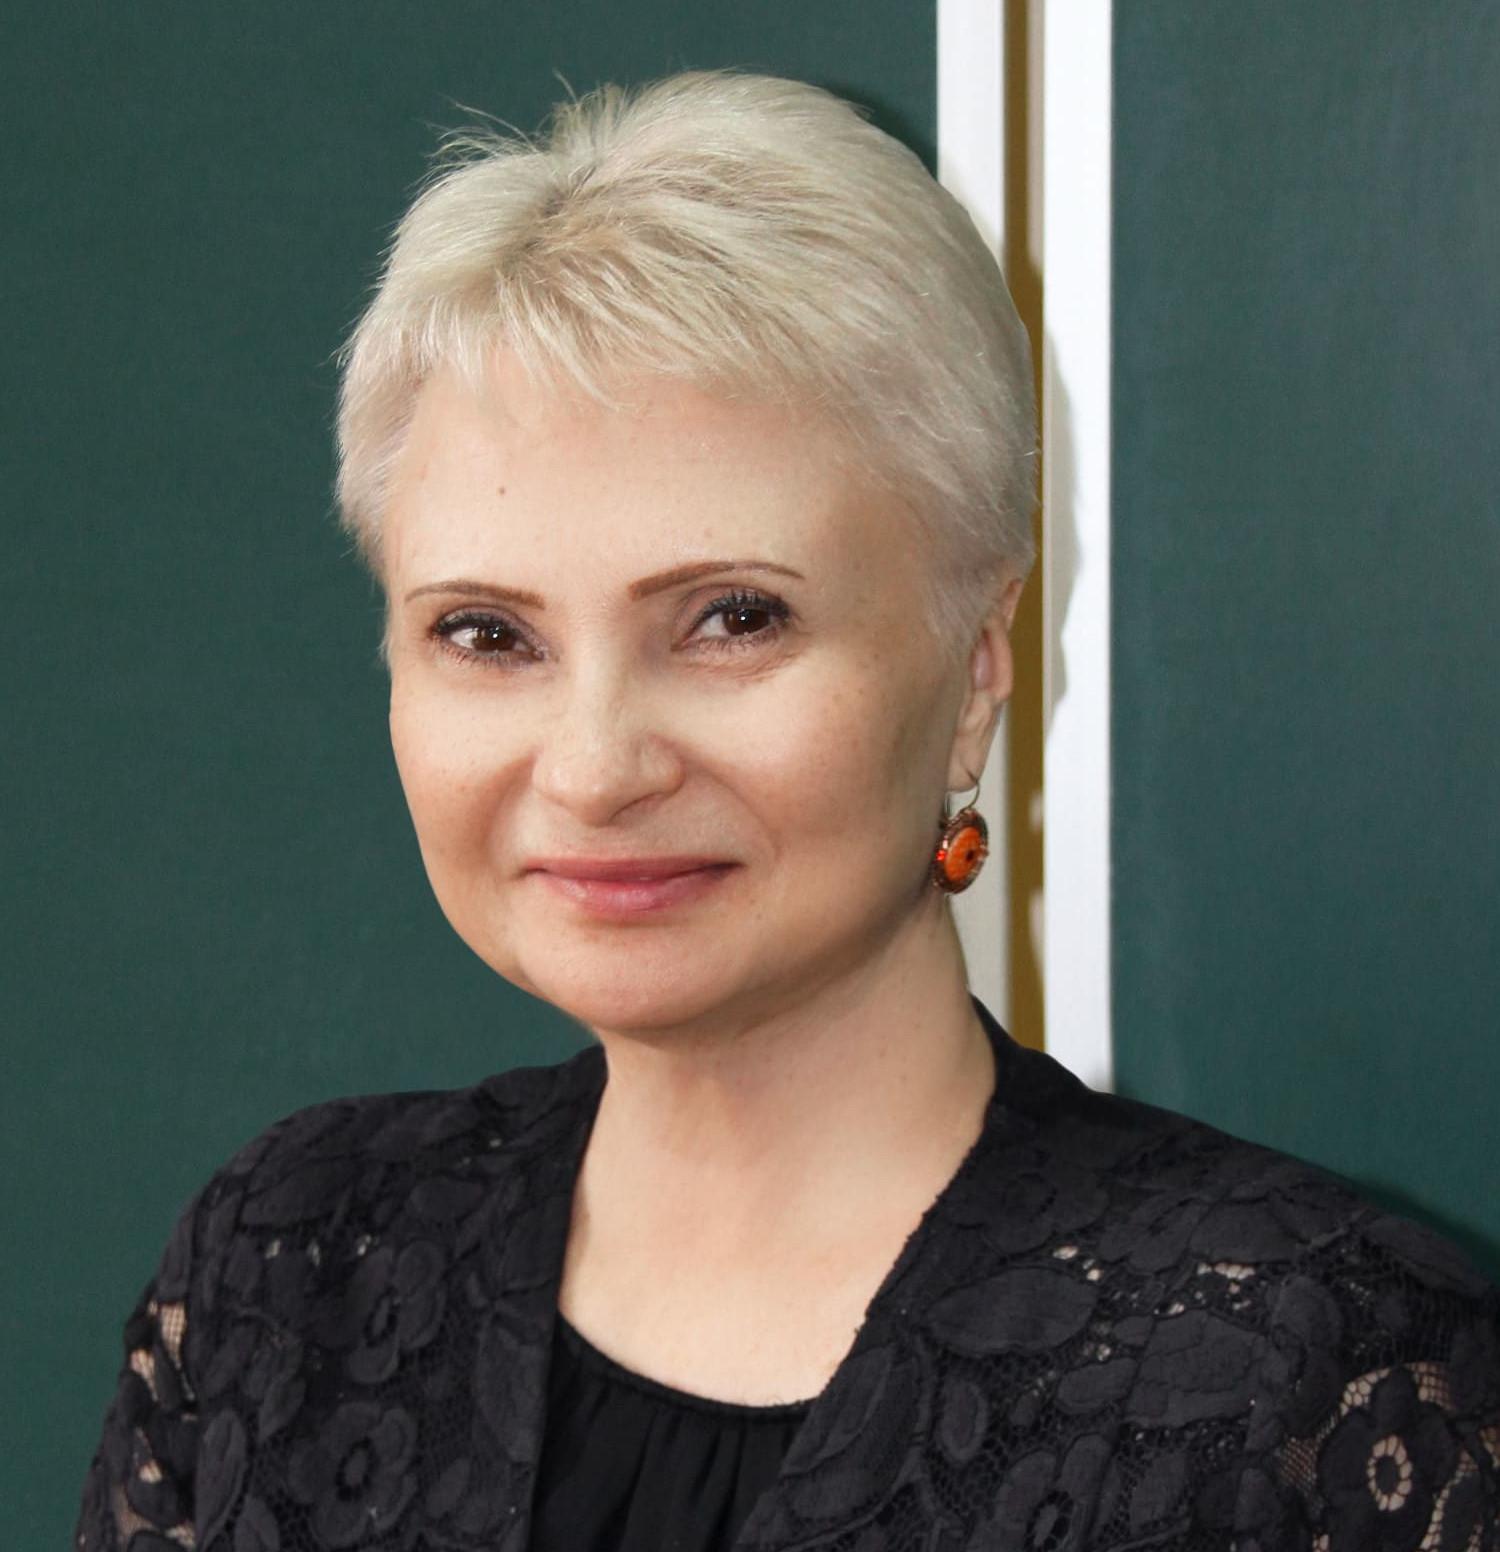 Звонова Елена Анатольевна